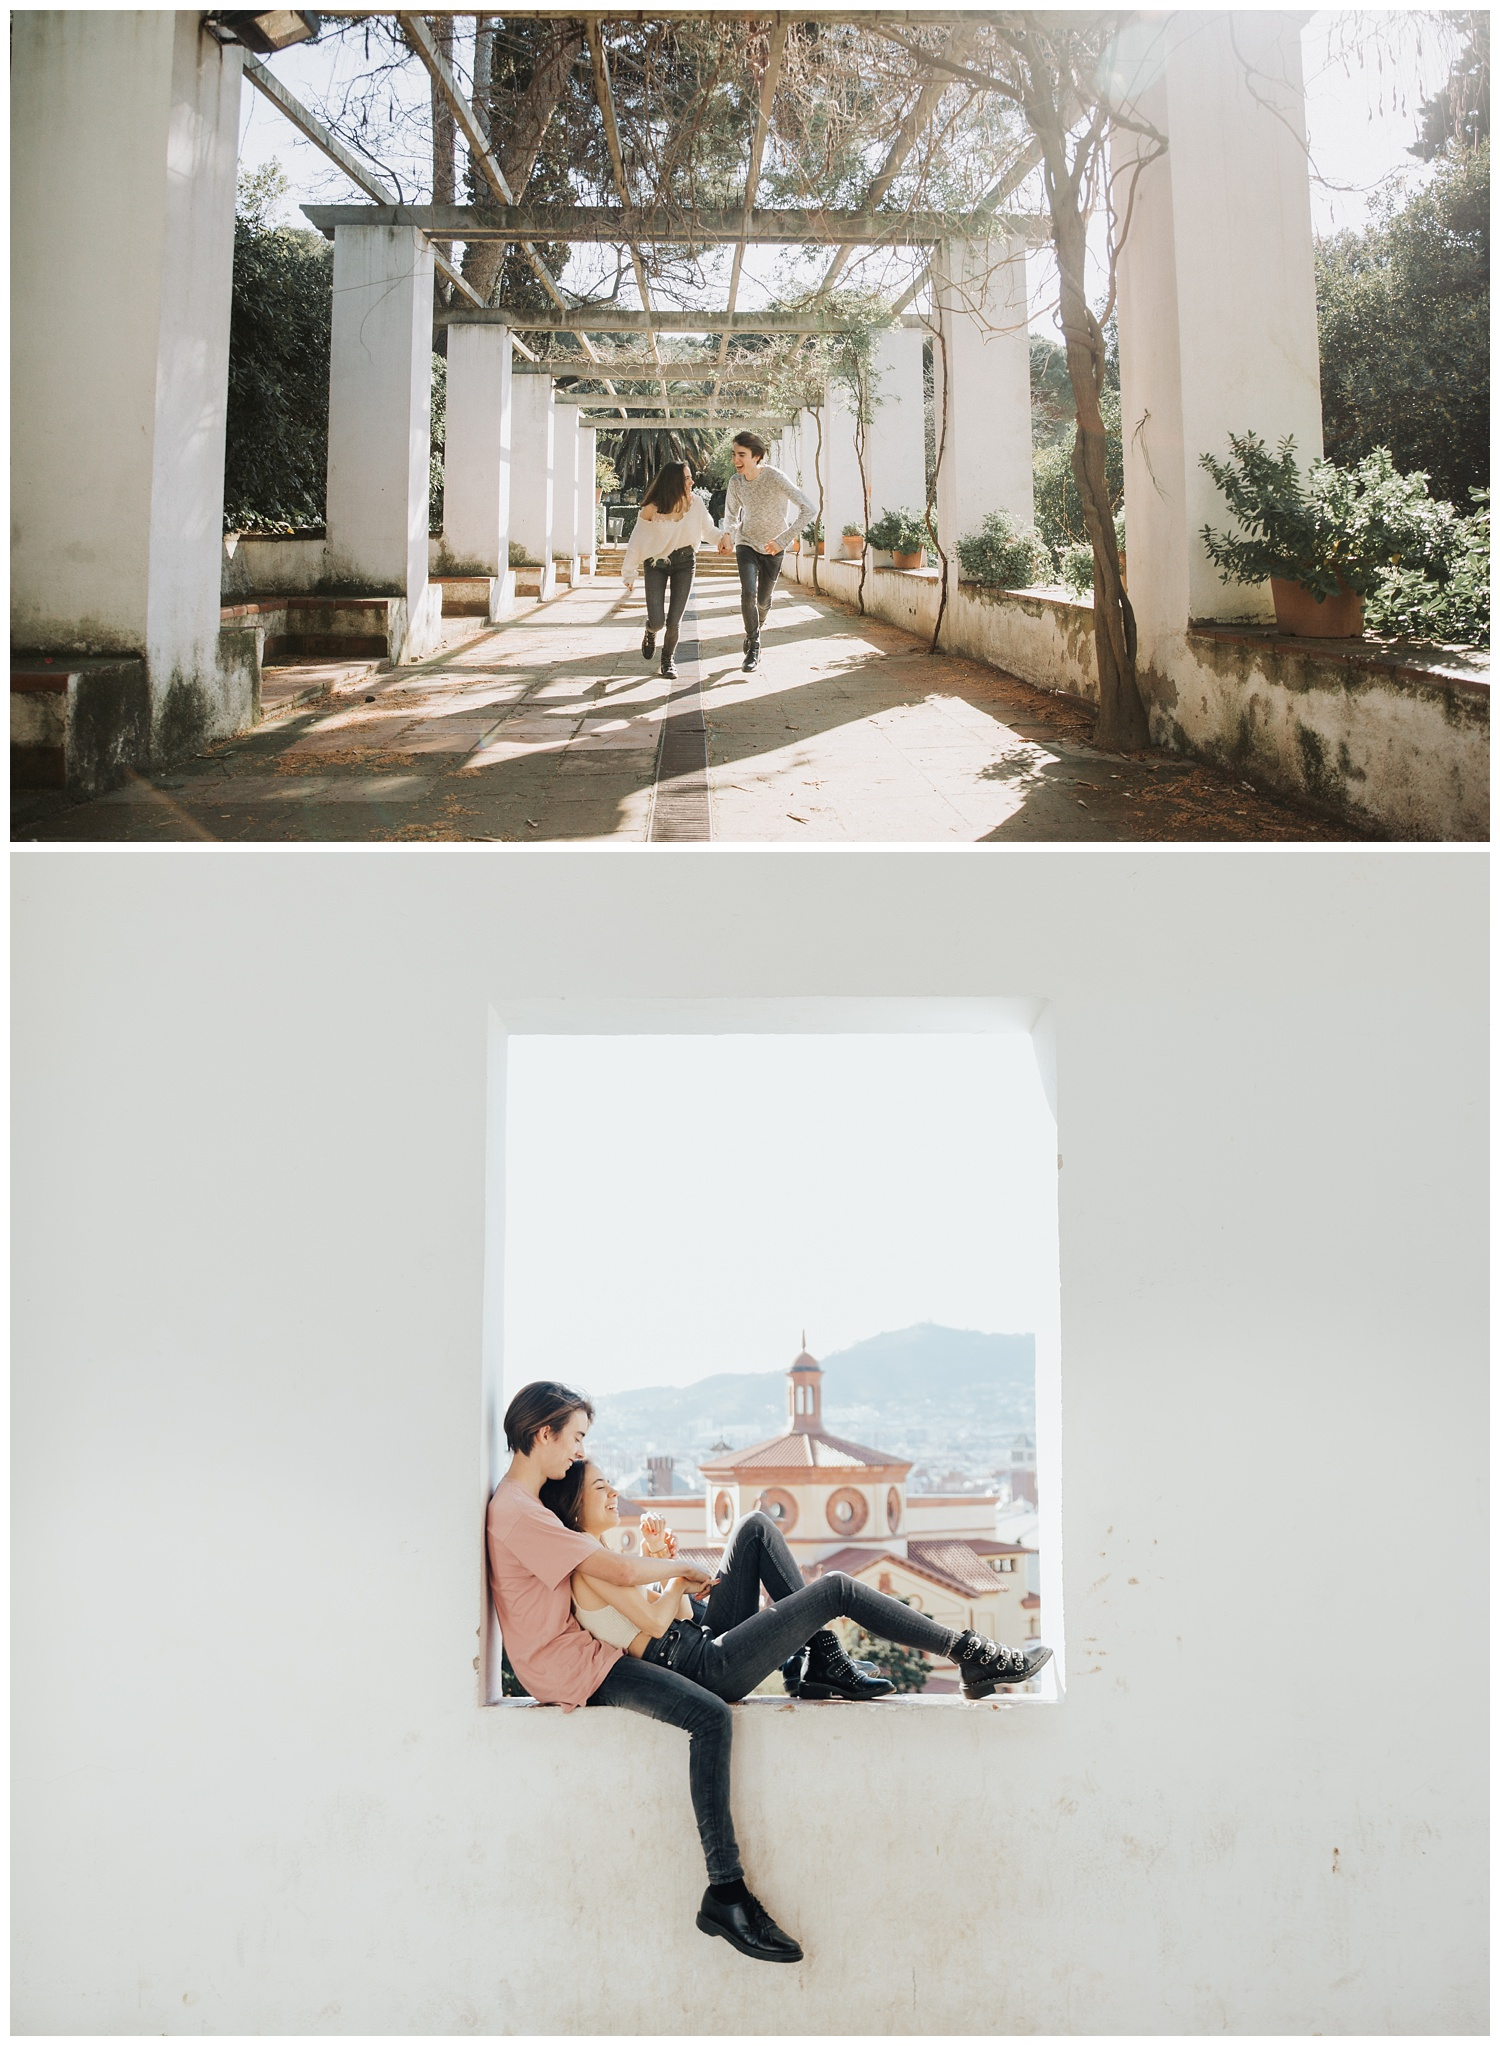 Meg's Marvels Photography - Barcelona Engagement Travel Photographer_0427.jpg